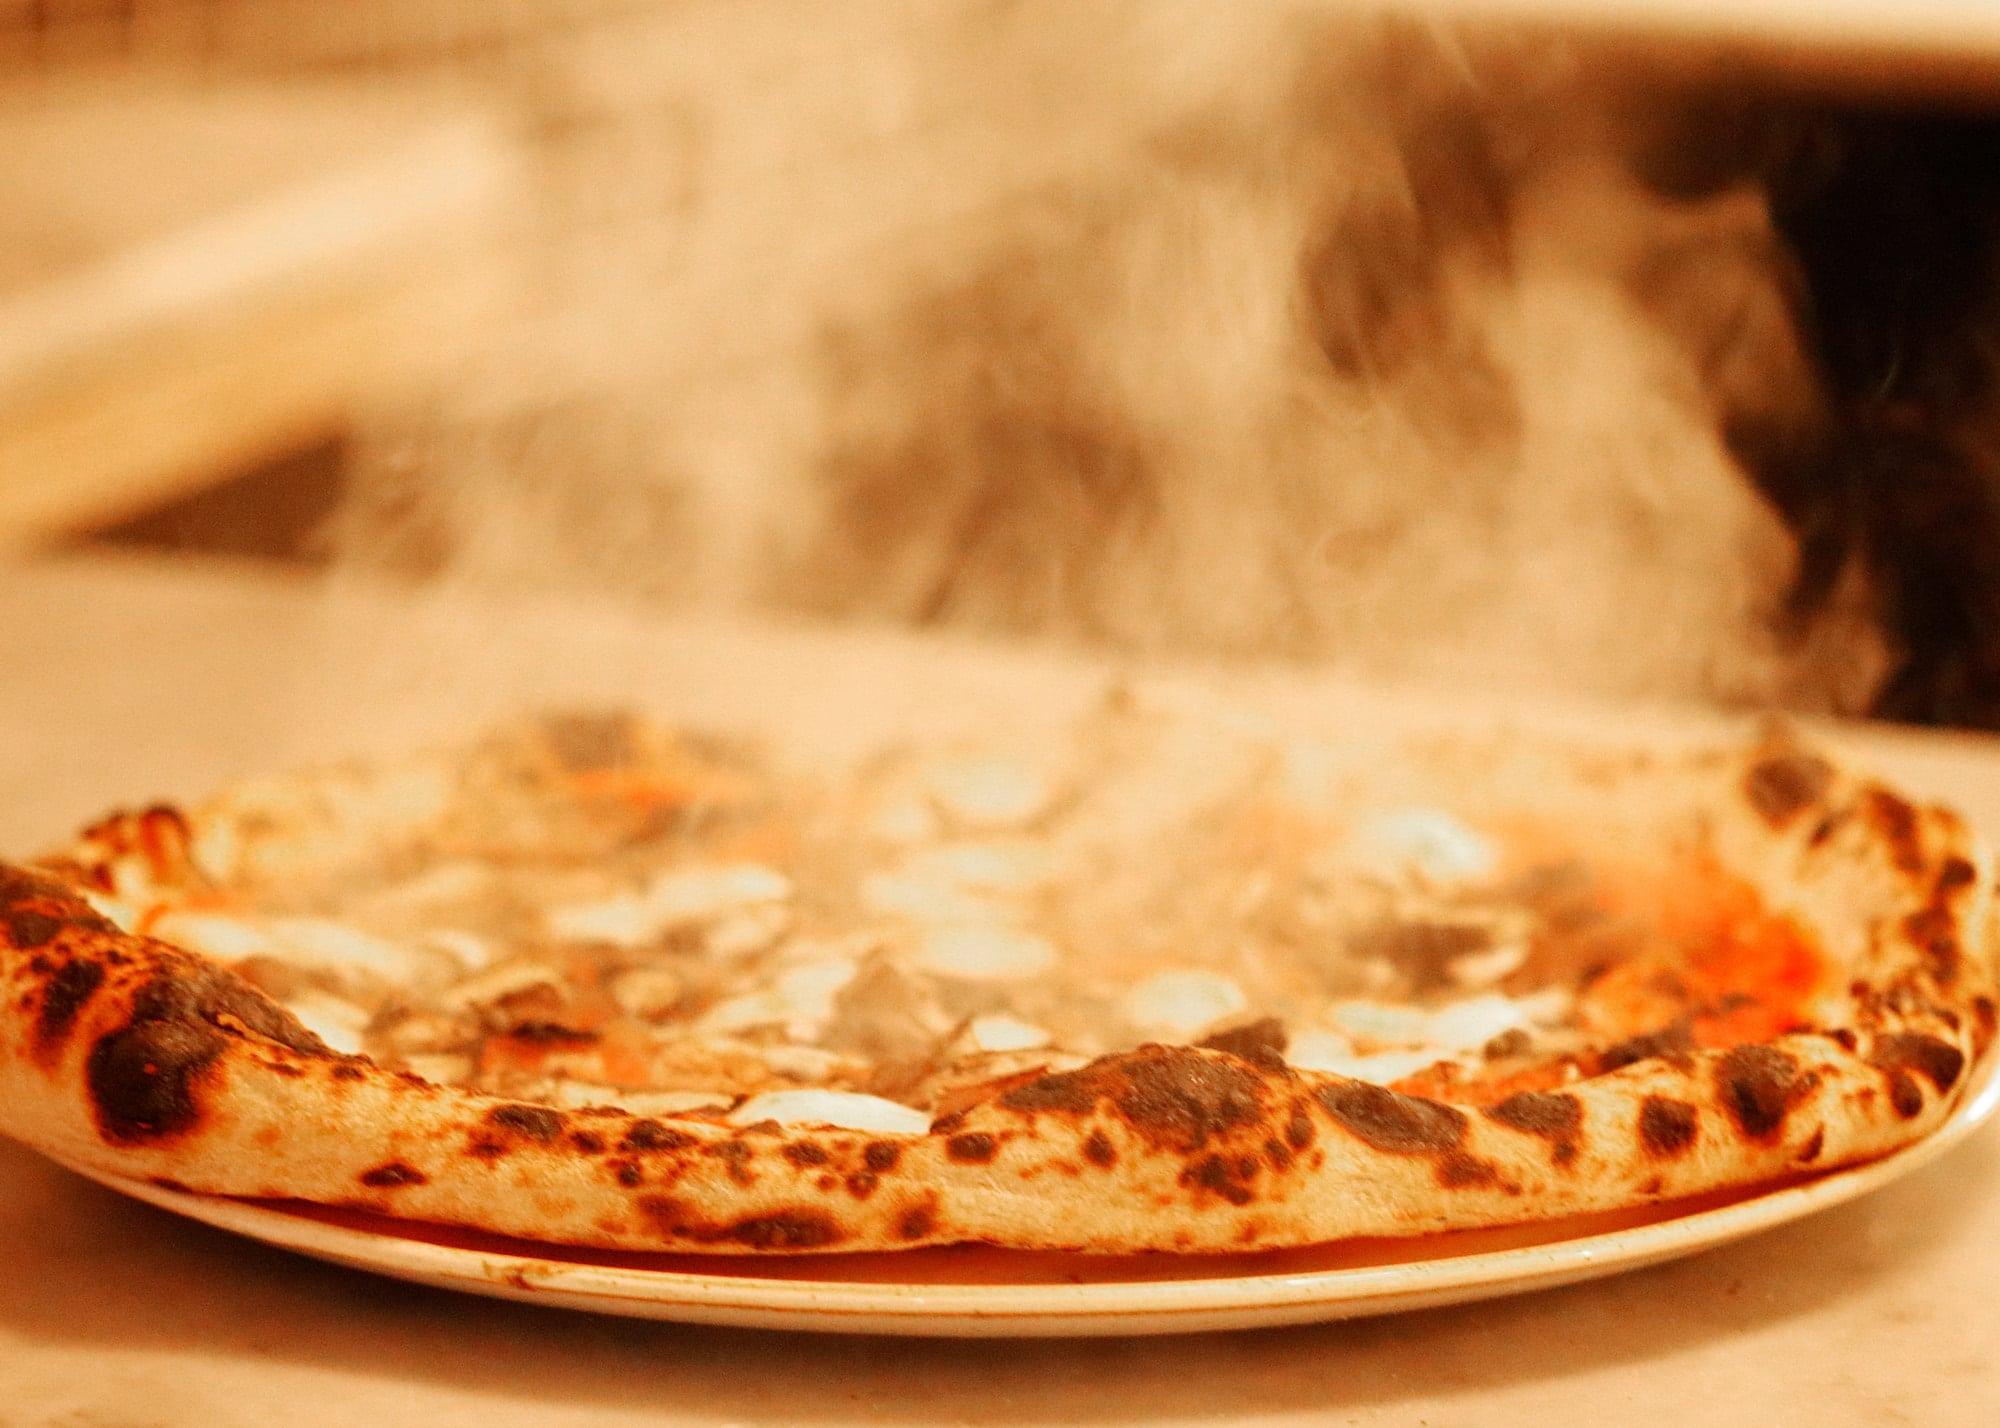 Woodbox Pizza Brighton Kemptown Dining Neopolitan Style